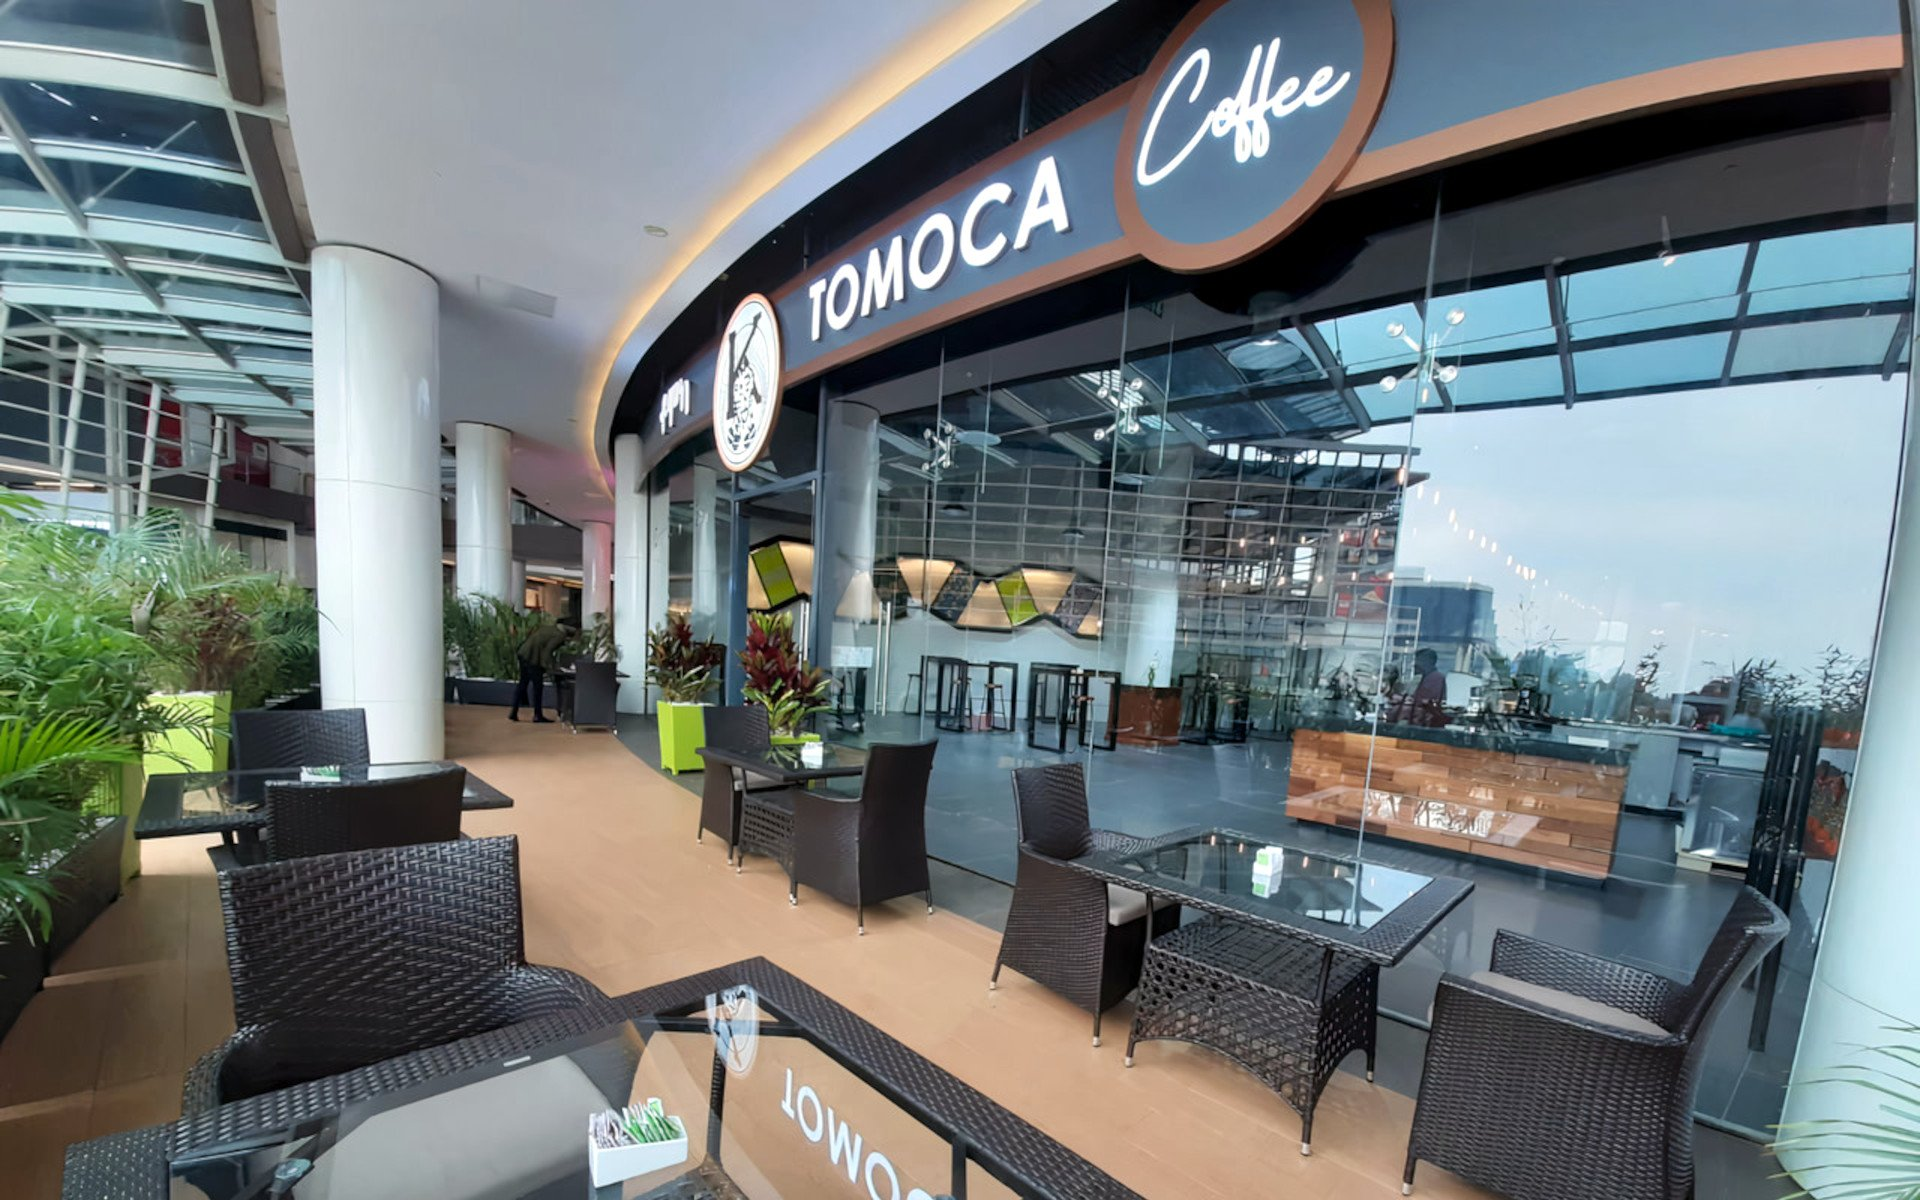 Tomoca Coffee Comes to Kenya